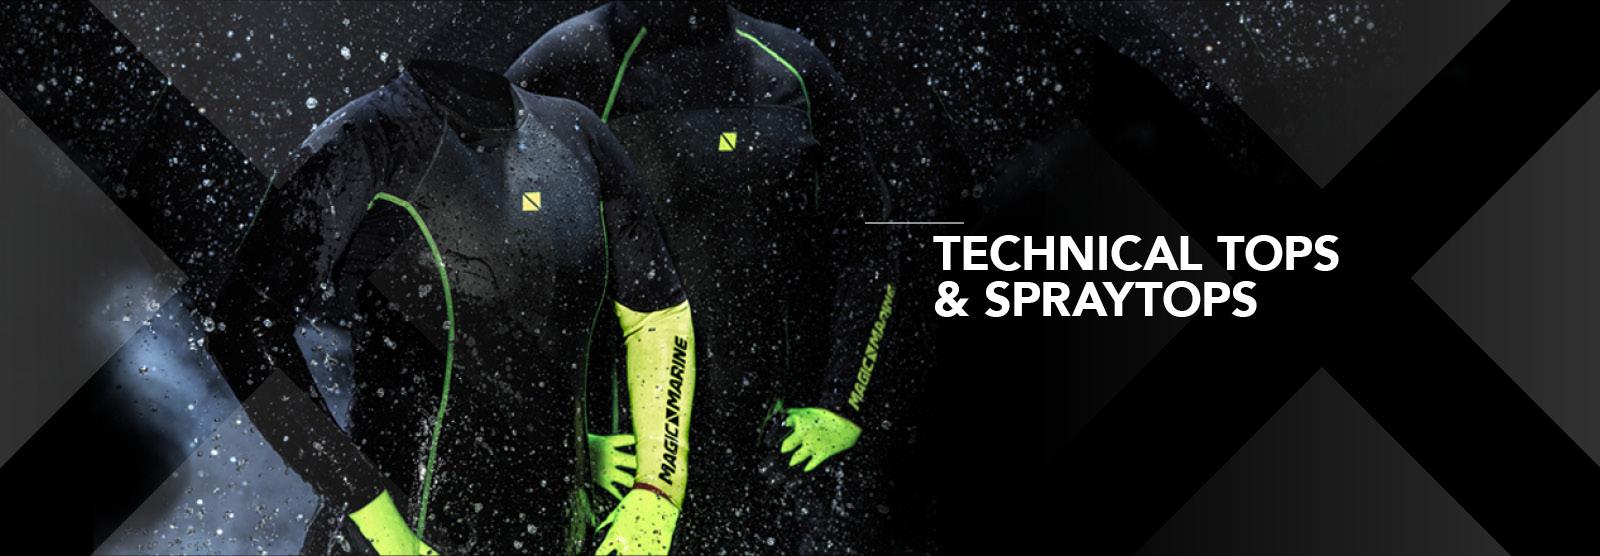 Technical Tops & Spraytop